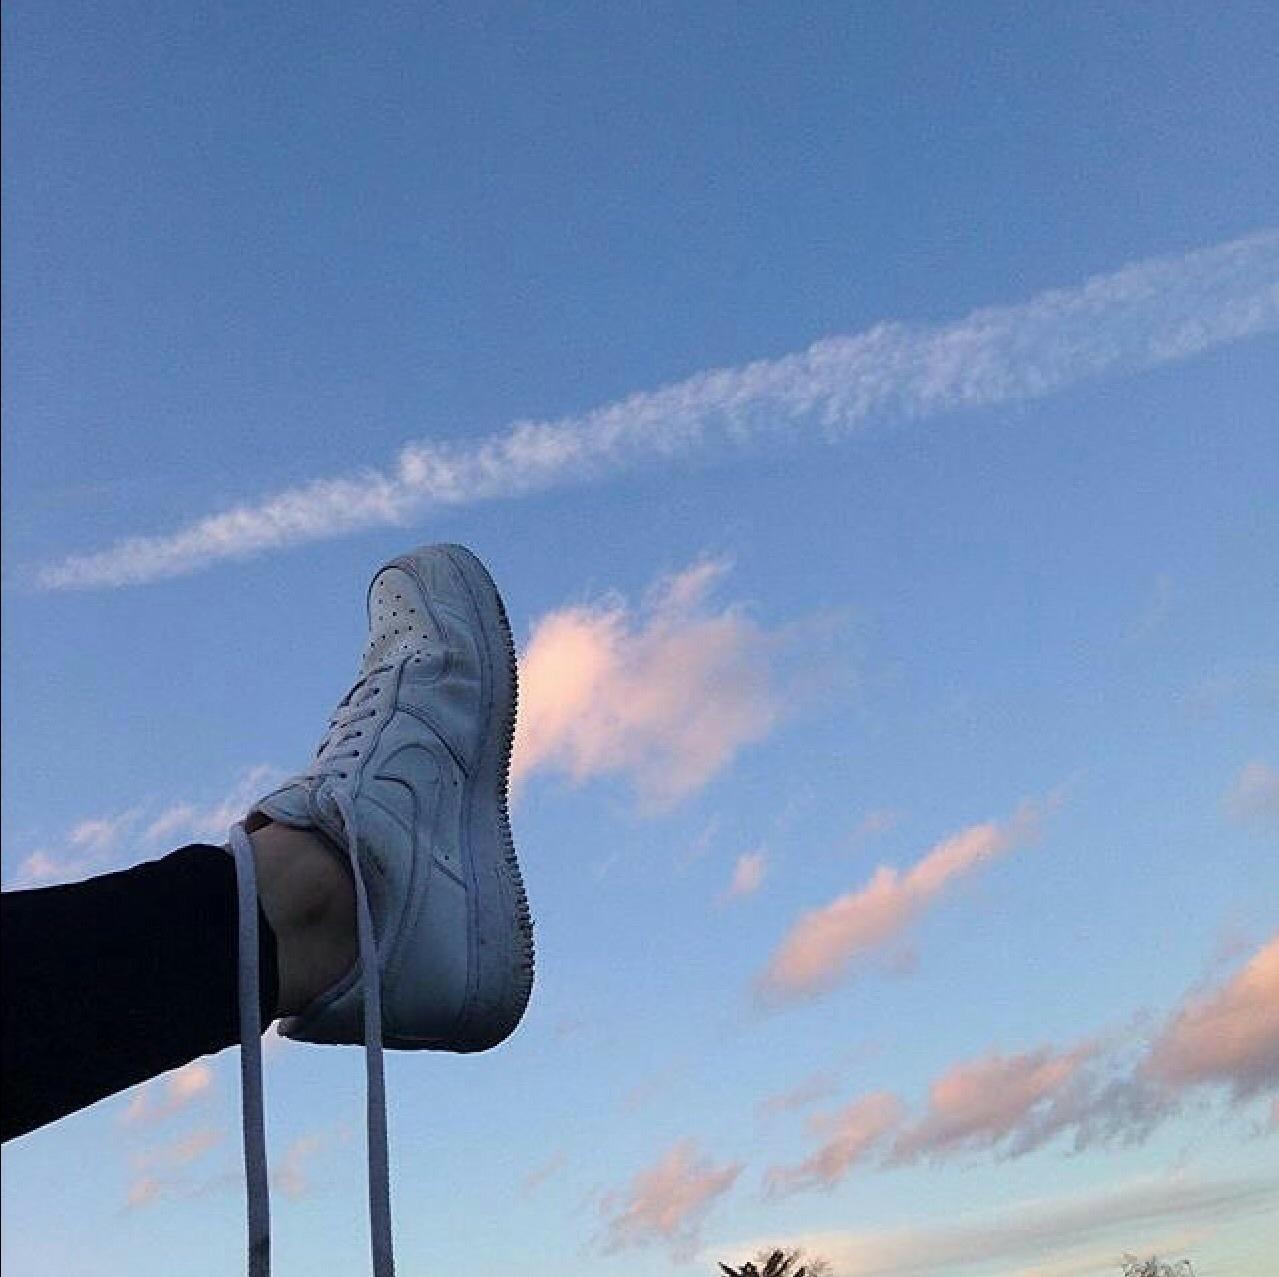 tumblr, alternative, and sky image